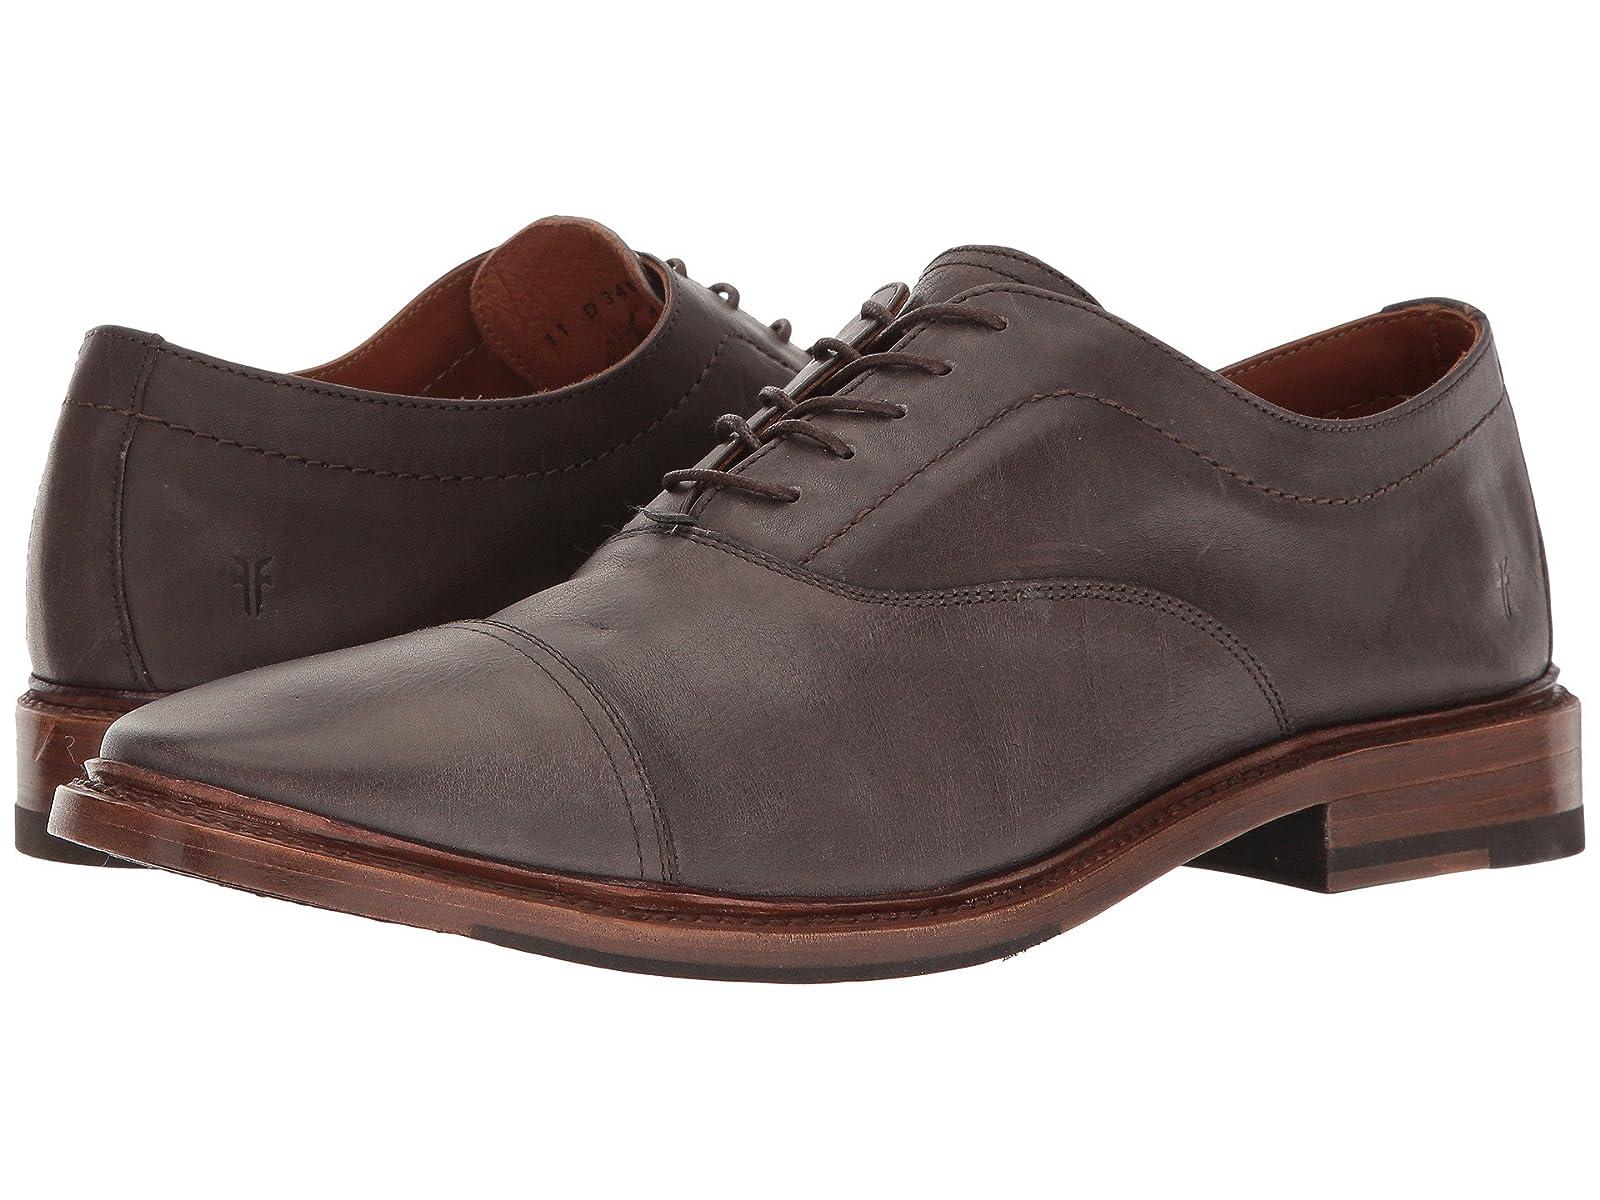 Frye Paul Bal OxfordAtmospheric grades have affordable shoes